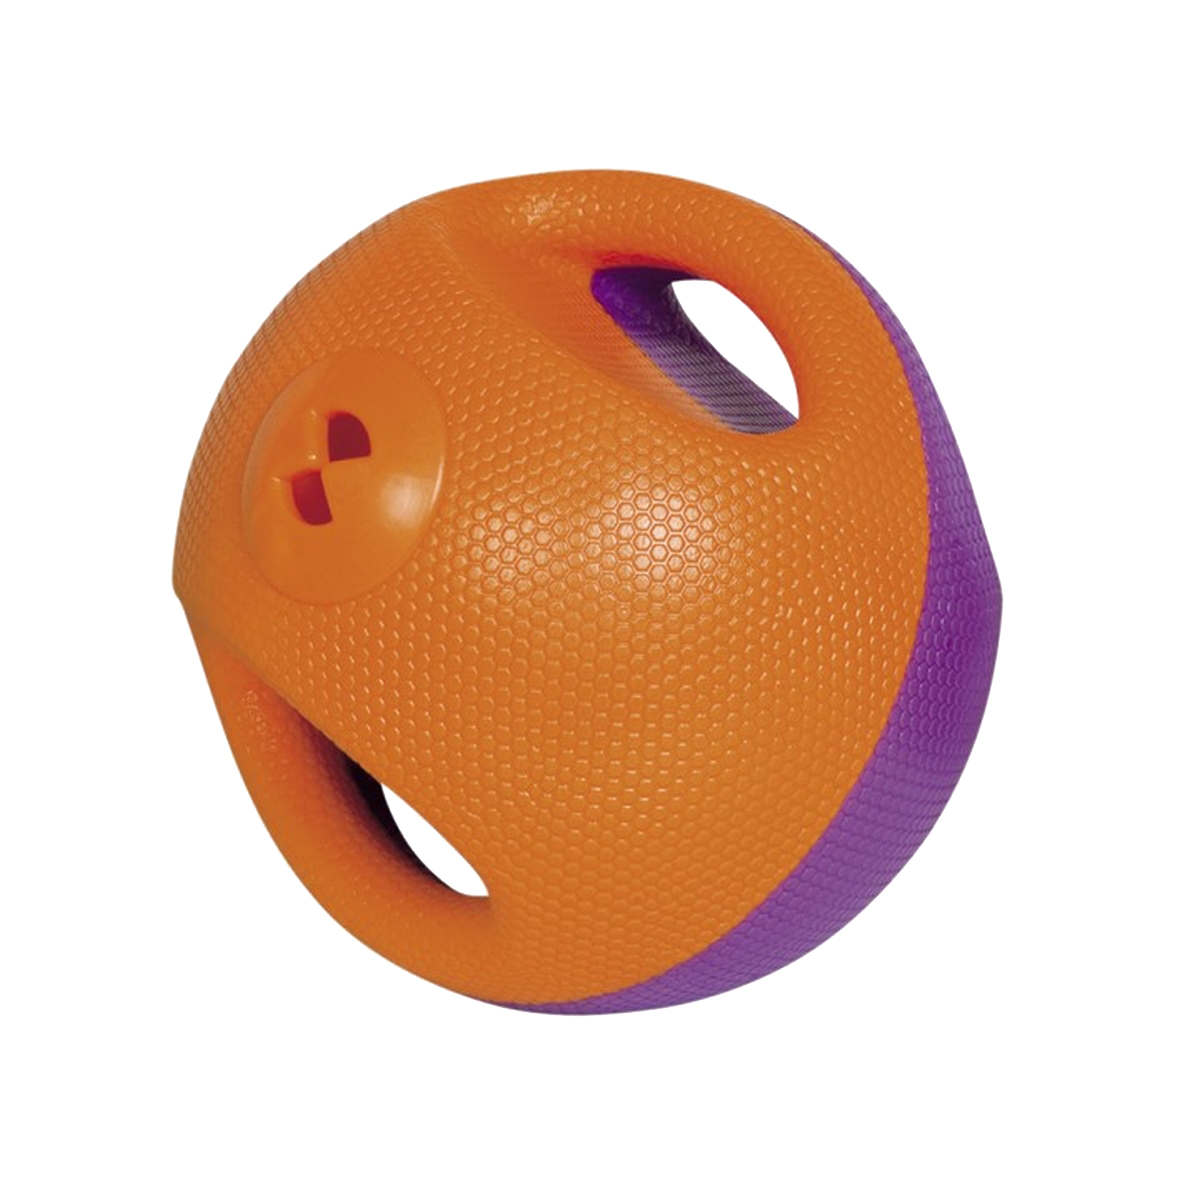 NB TPR BALL POWER 18,5CM 00001